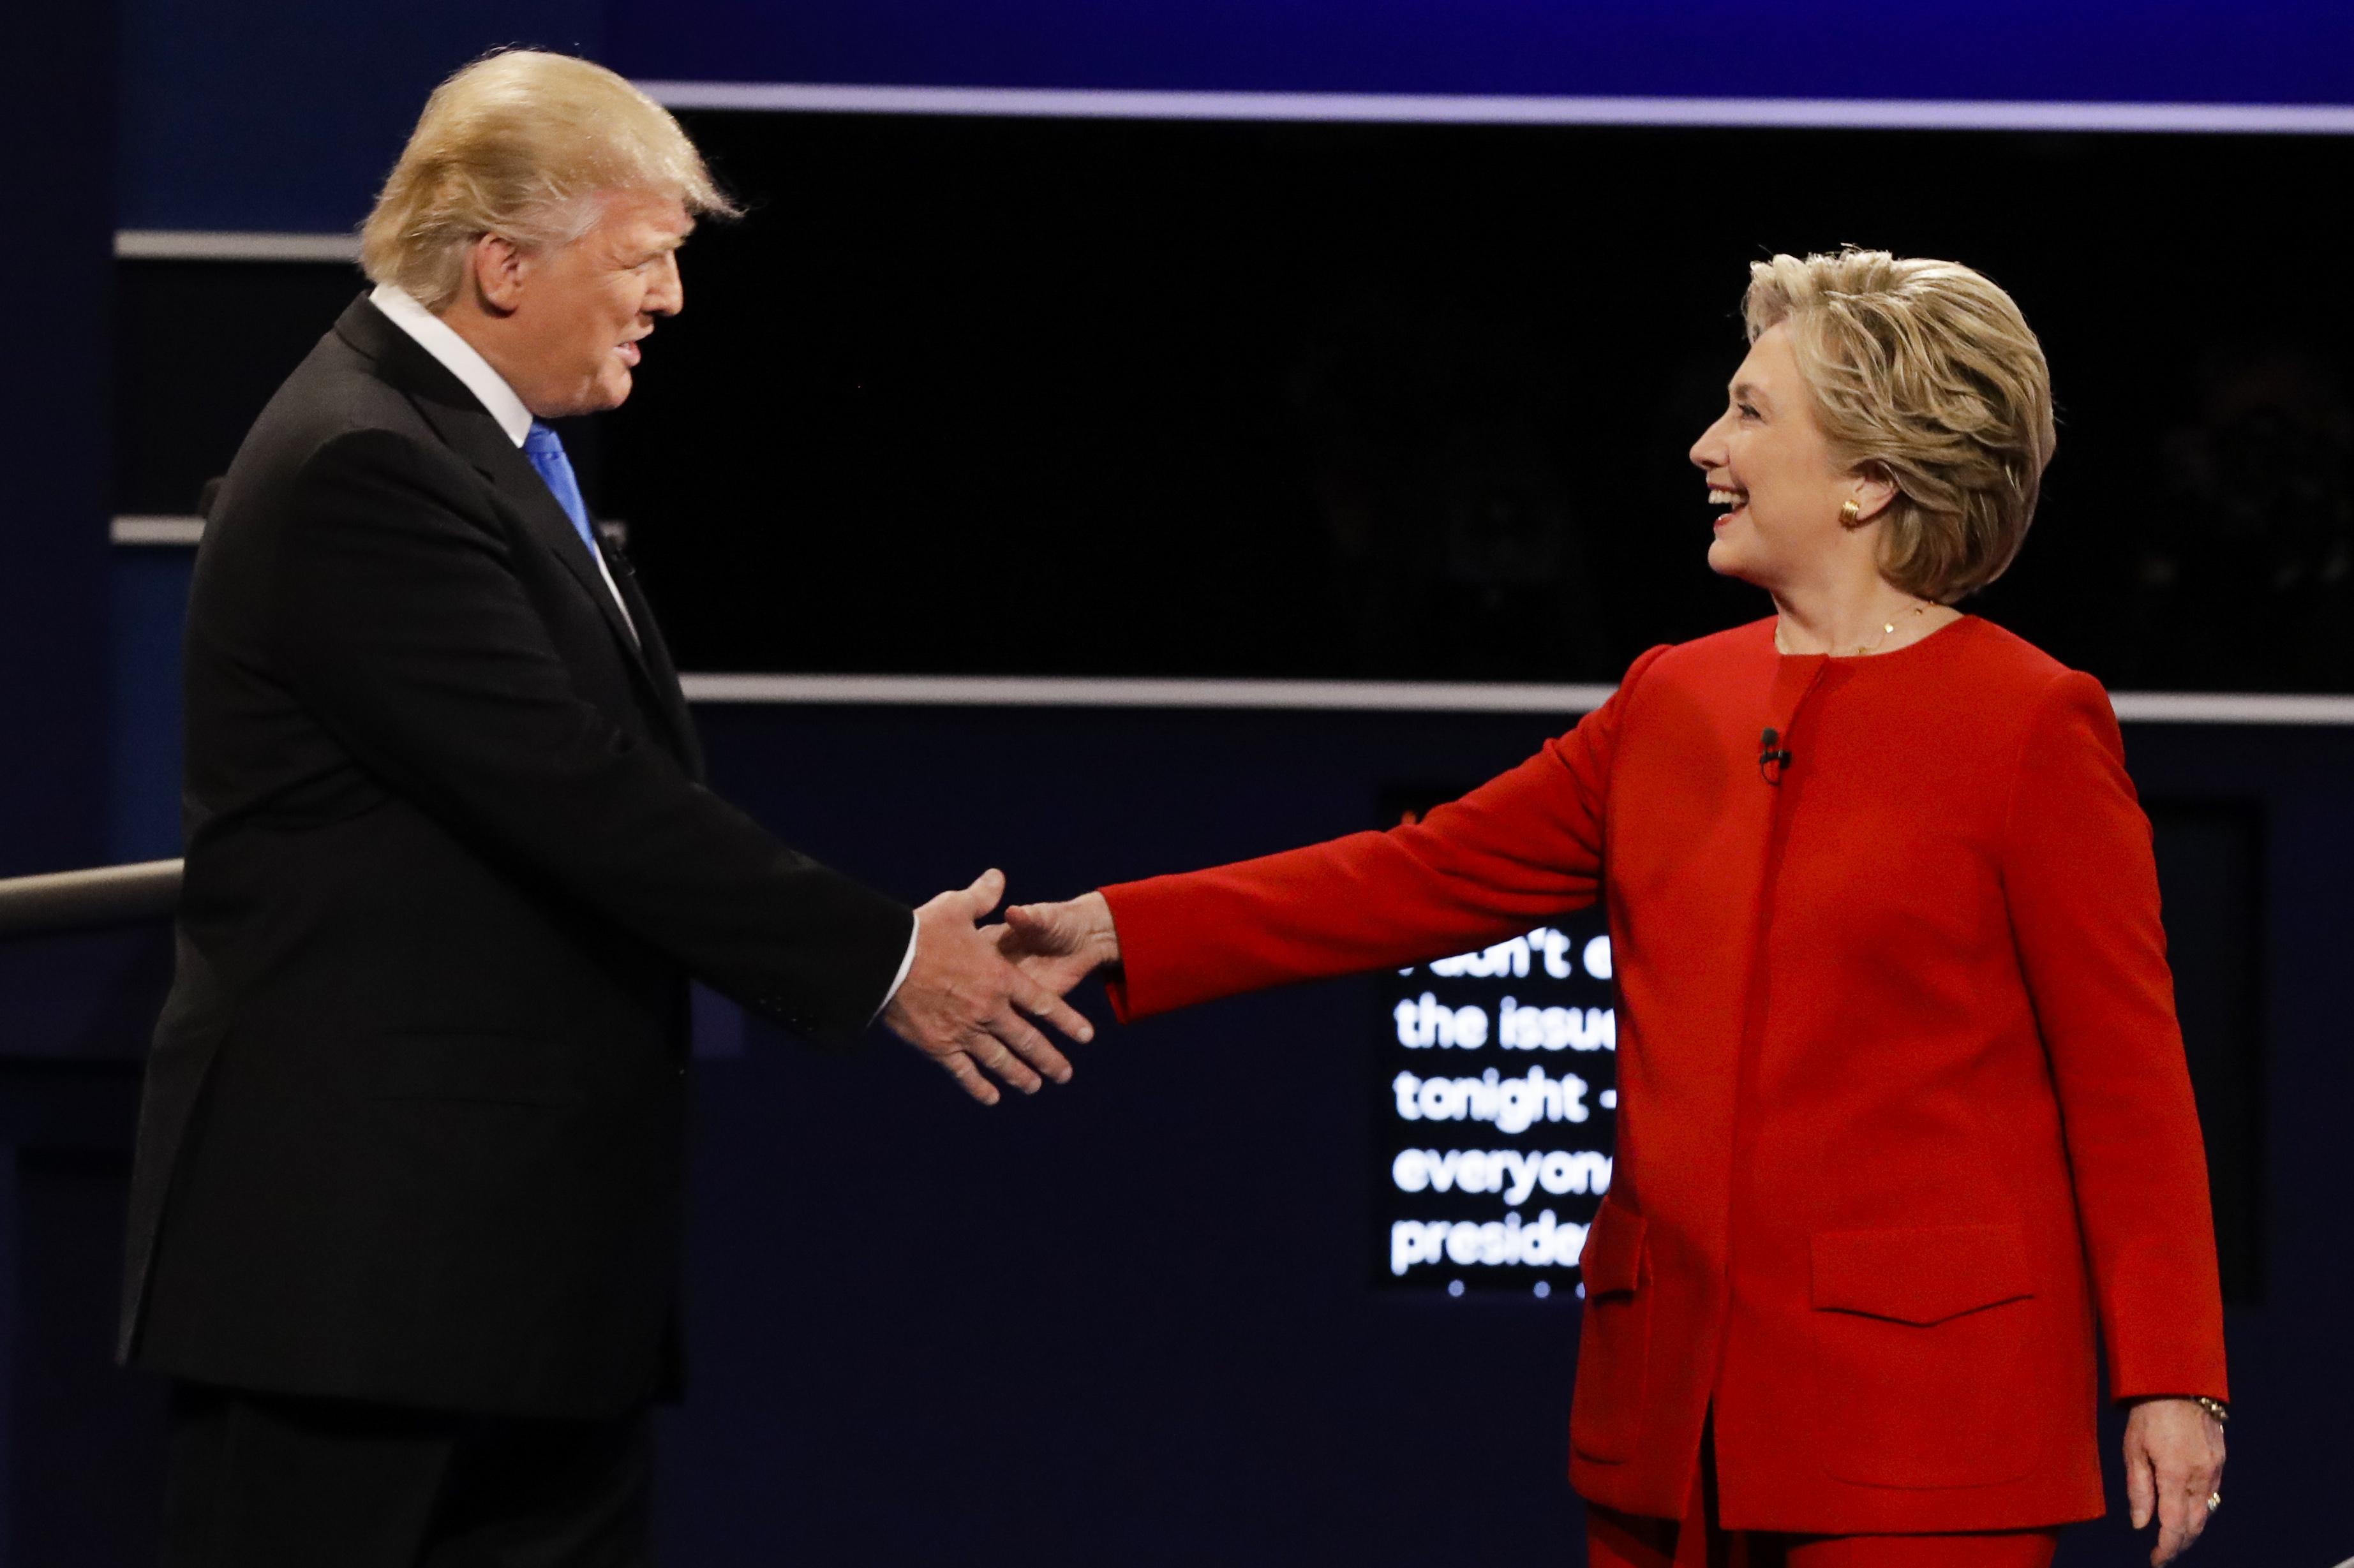 Trump, Clinton have work to do to make Utah voters 'comfortable' following debate